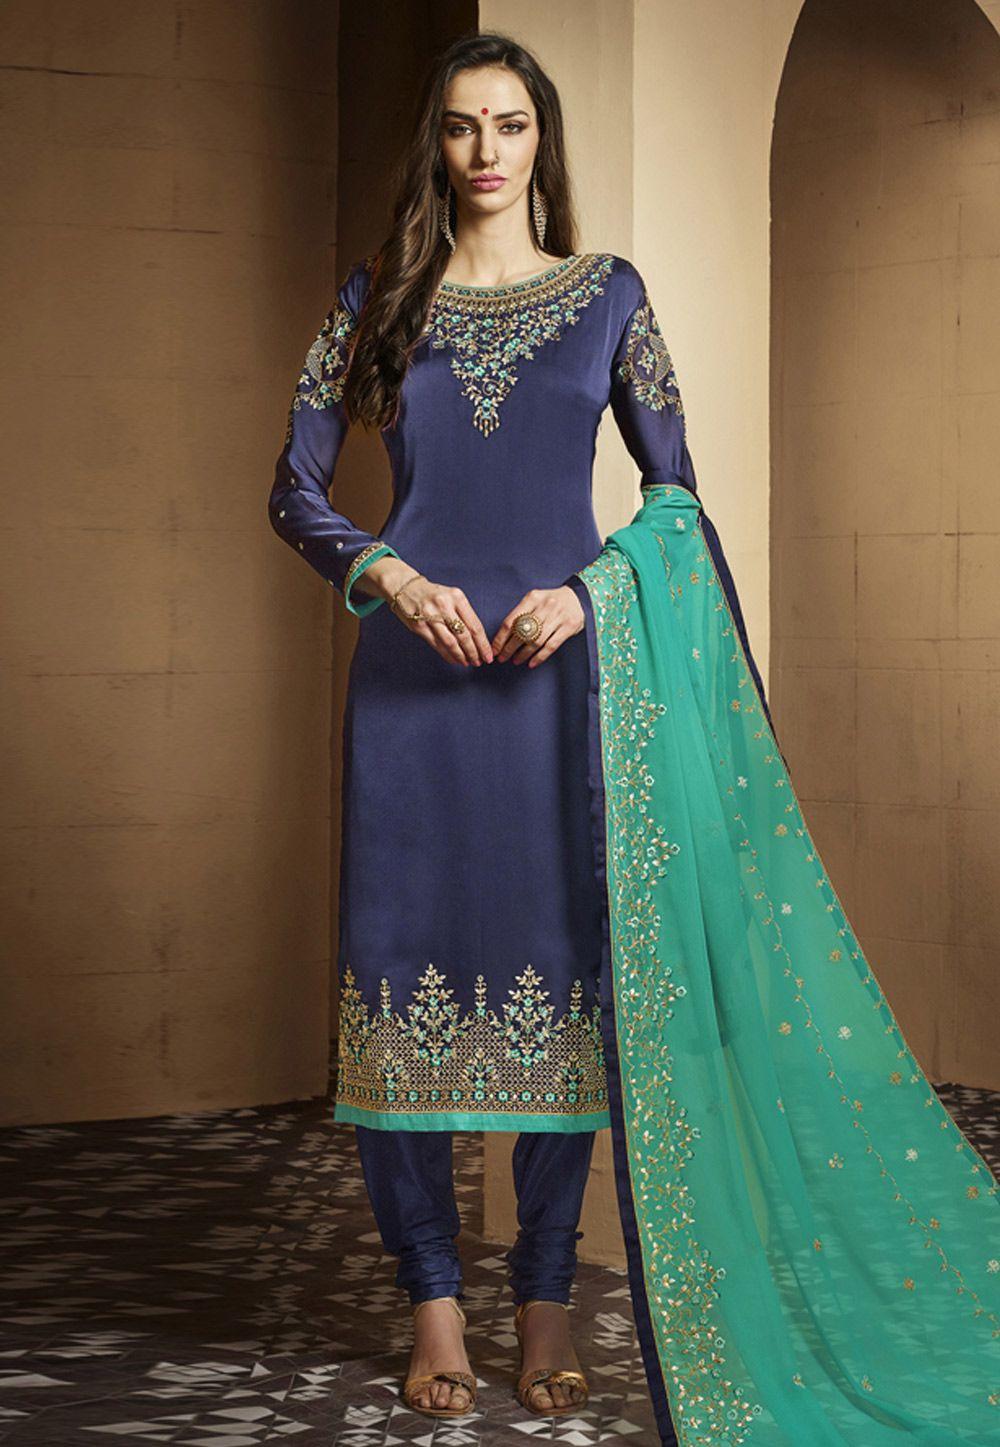 1d2d67767e Buy Navy Blue Satin Churidar Suit 156437 online at lowest price from huge  collection of salwar kameez at Indianclothstore.com.